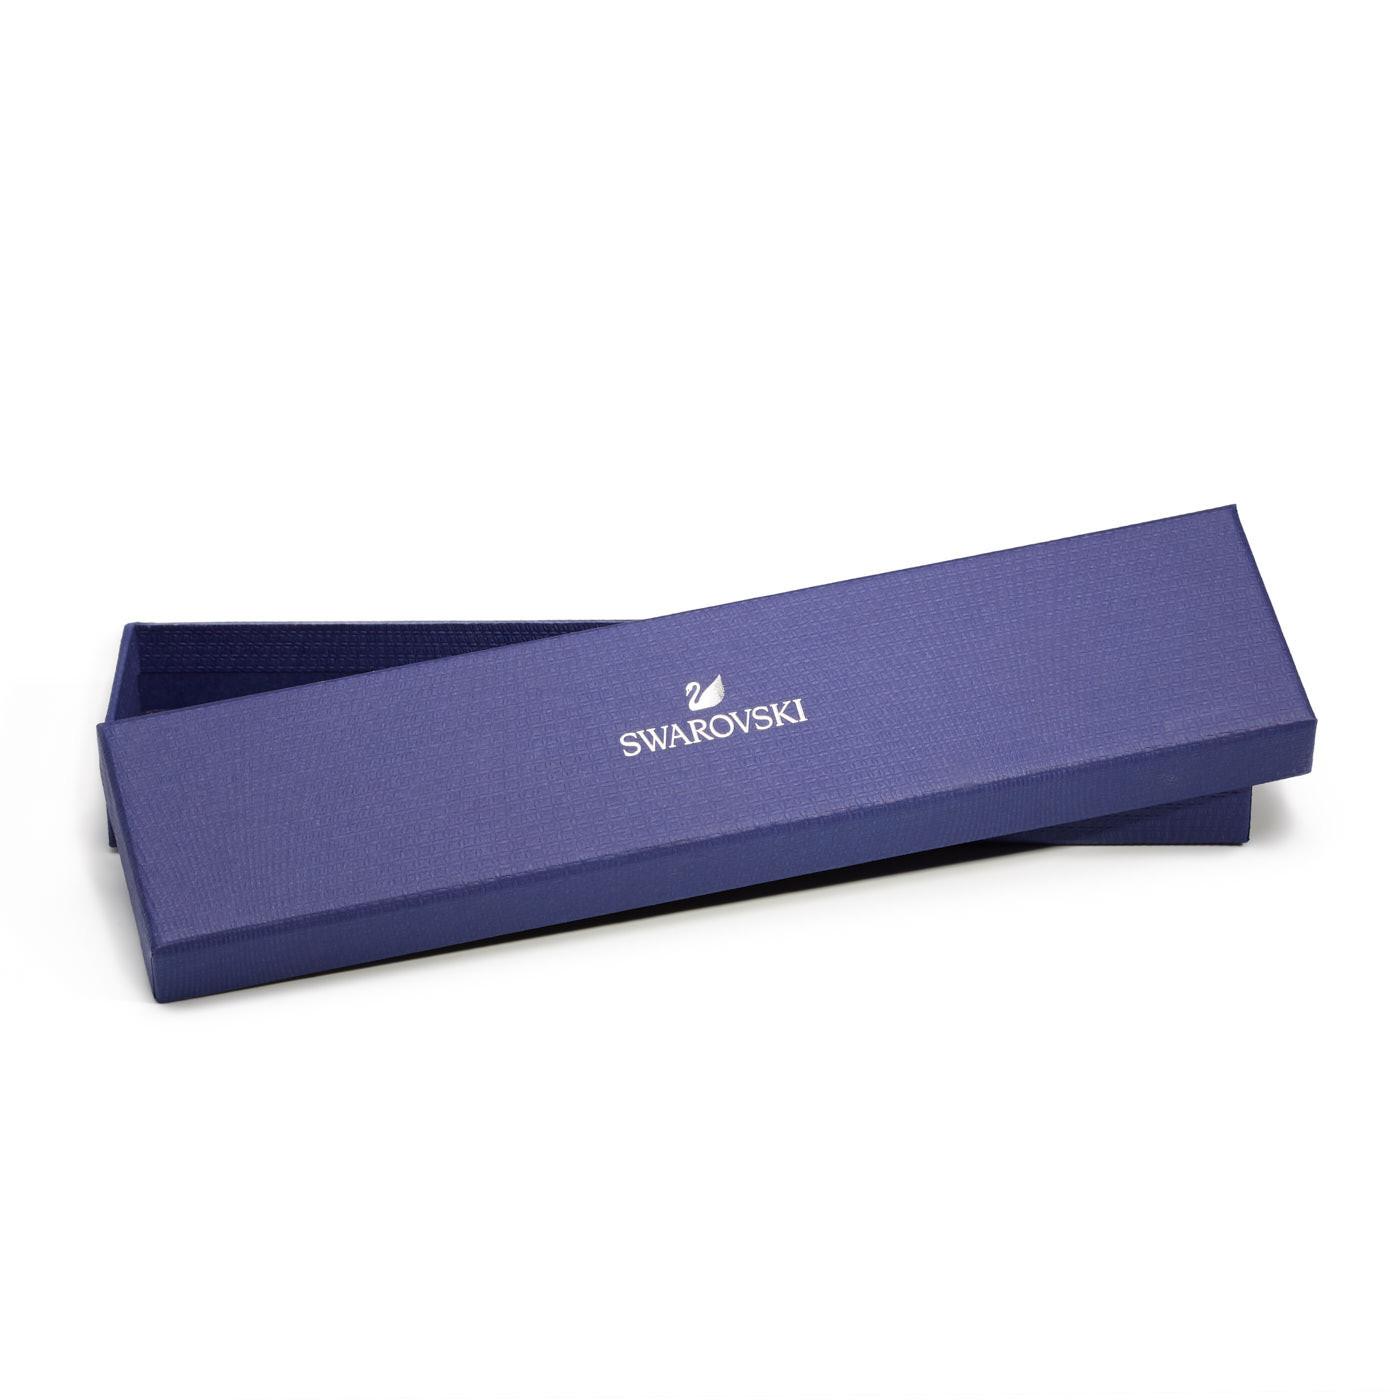 Swarovski Crystaldust Armband crystaldust-cuff-crystalmoonlight ... 952c46b247d08